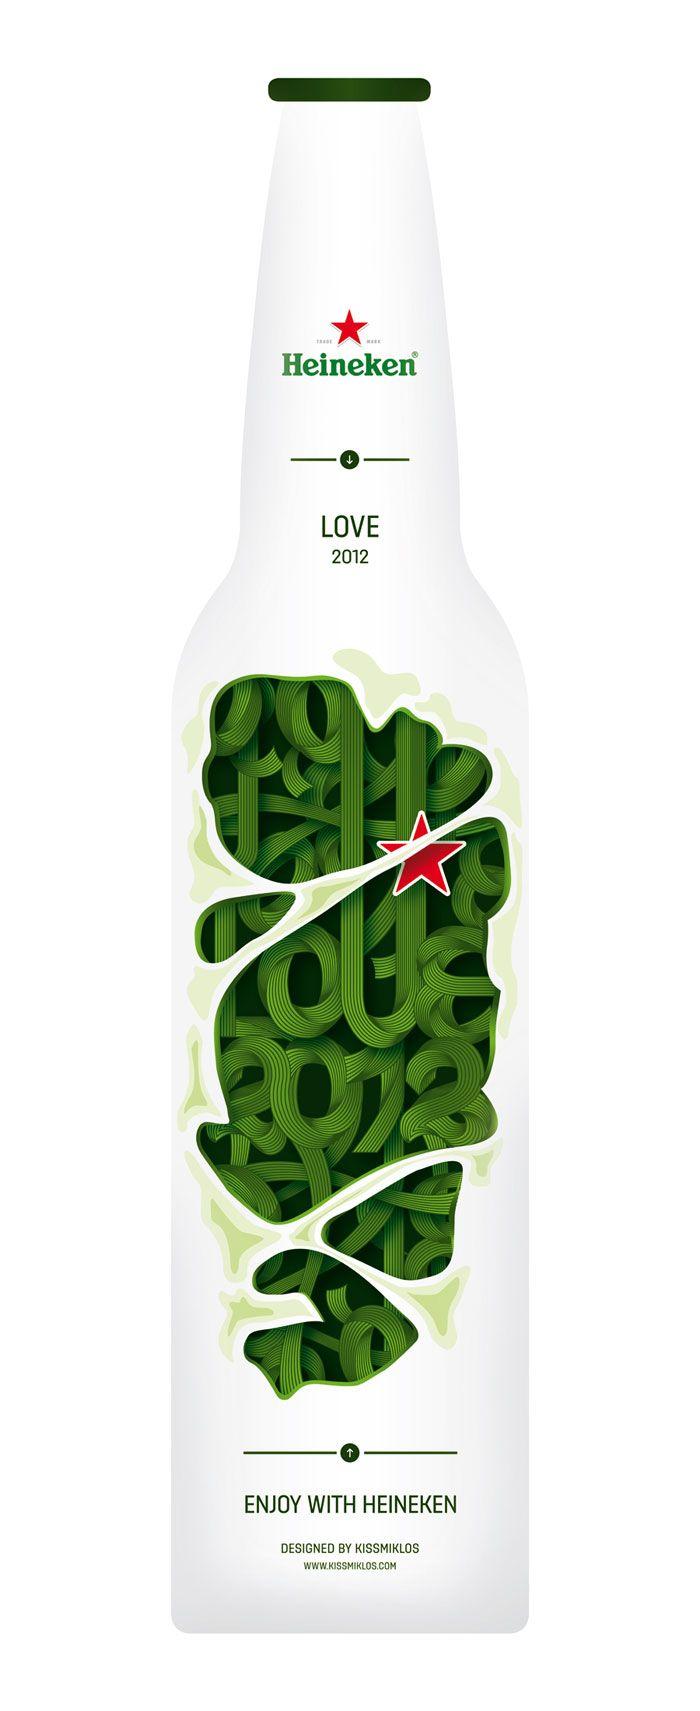 botella de heineken rechula via the Dieline: Design Inspiration, Heineken Bottle, Packaging Design, Bottle Packaging, Beer Packaging, Beer Bottle, Design Concept, Beer Design, Bottle Design